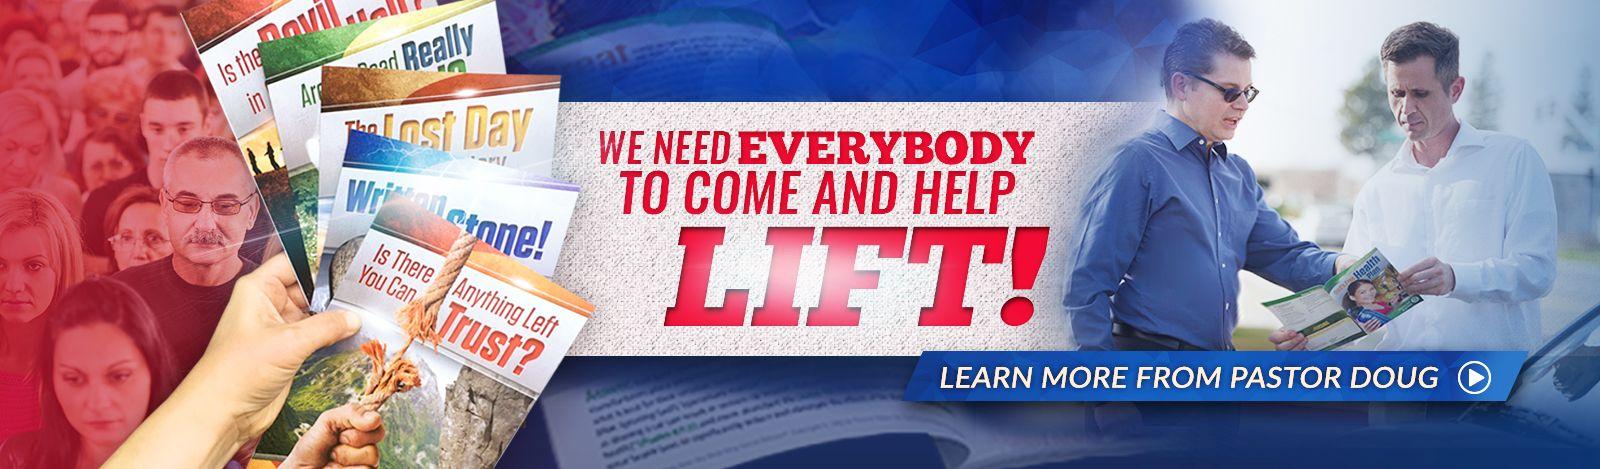 We need everyone to help lift!